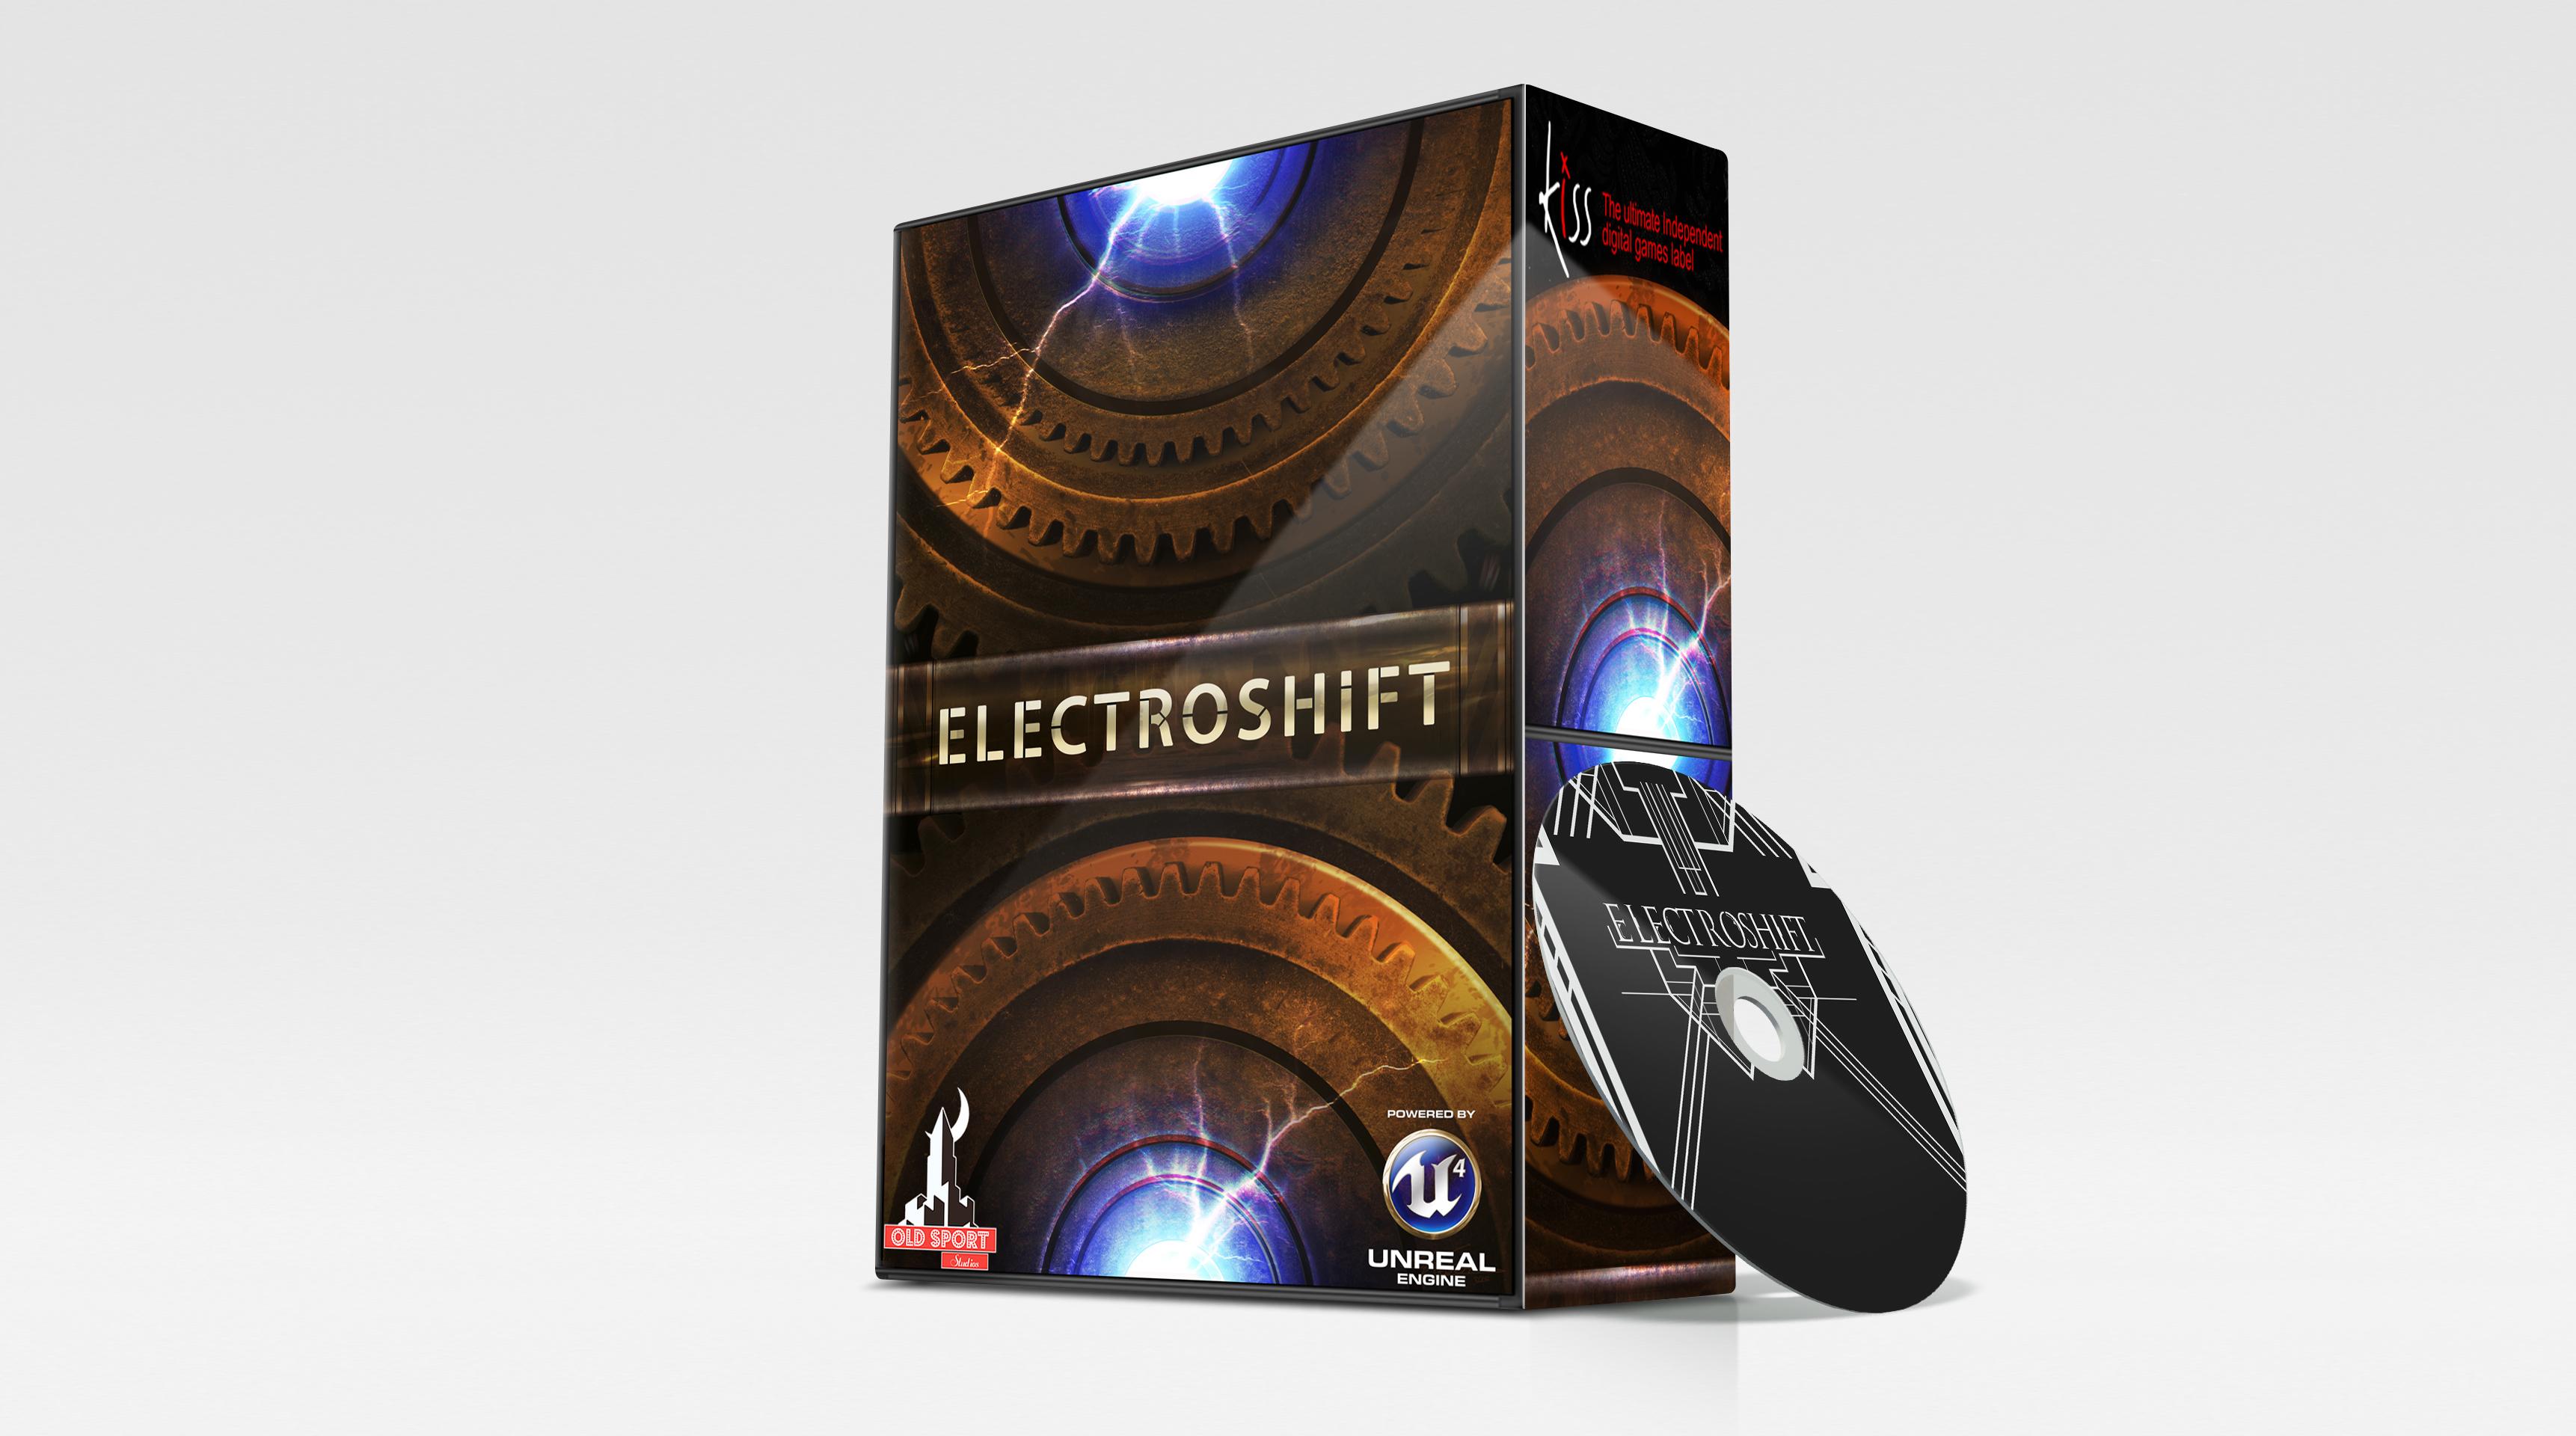 electroshift official